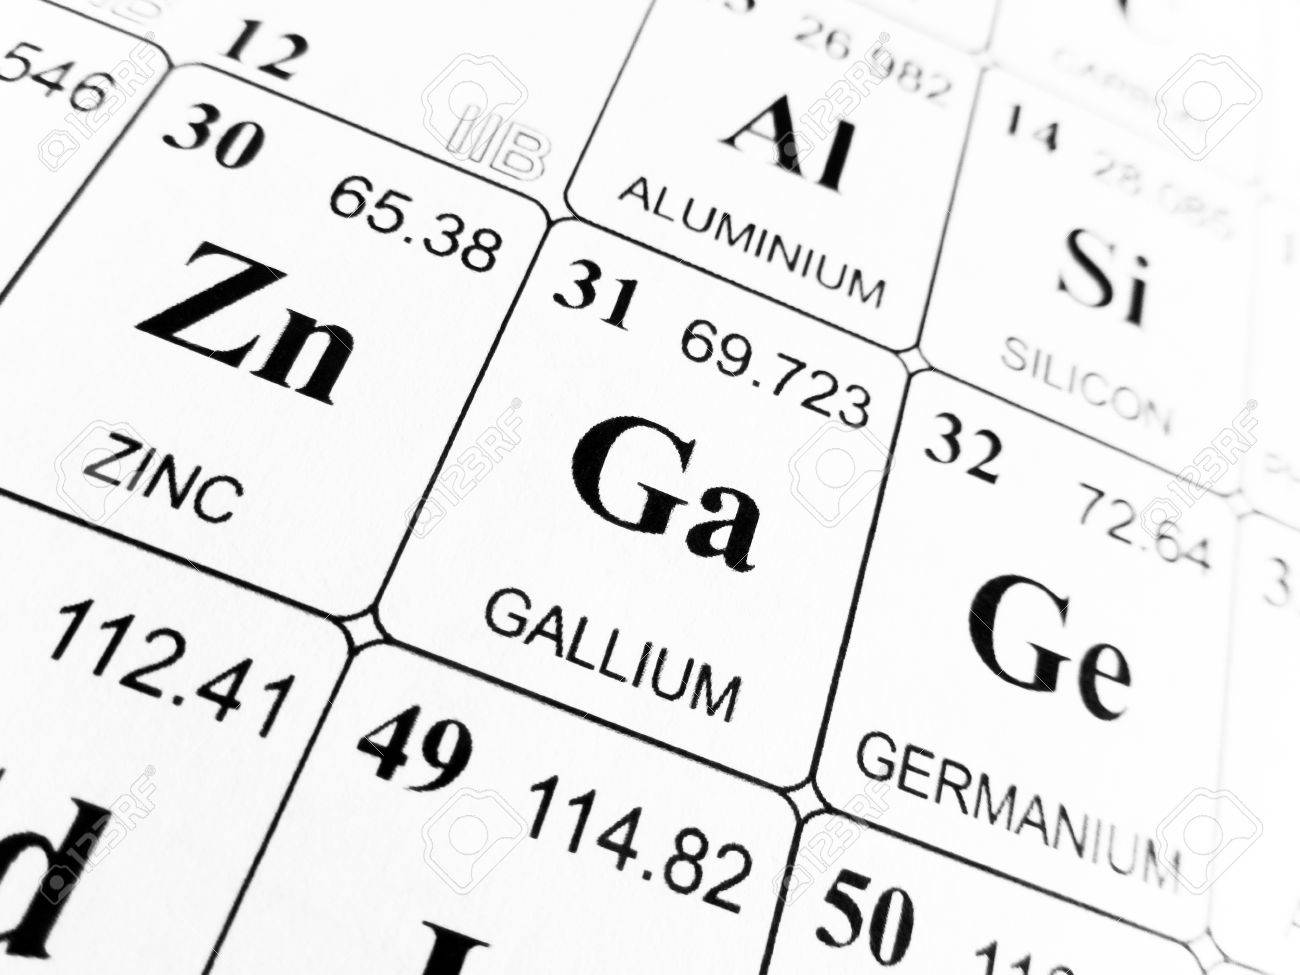 Periodic table aluminium choice image periodic table images gallium on the periodic table of the elements stock photo picture gallium on the periodic table gamestrikefo Gallery